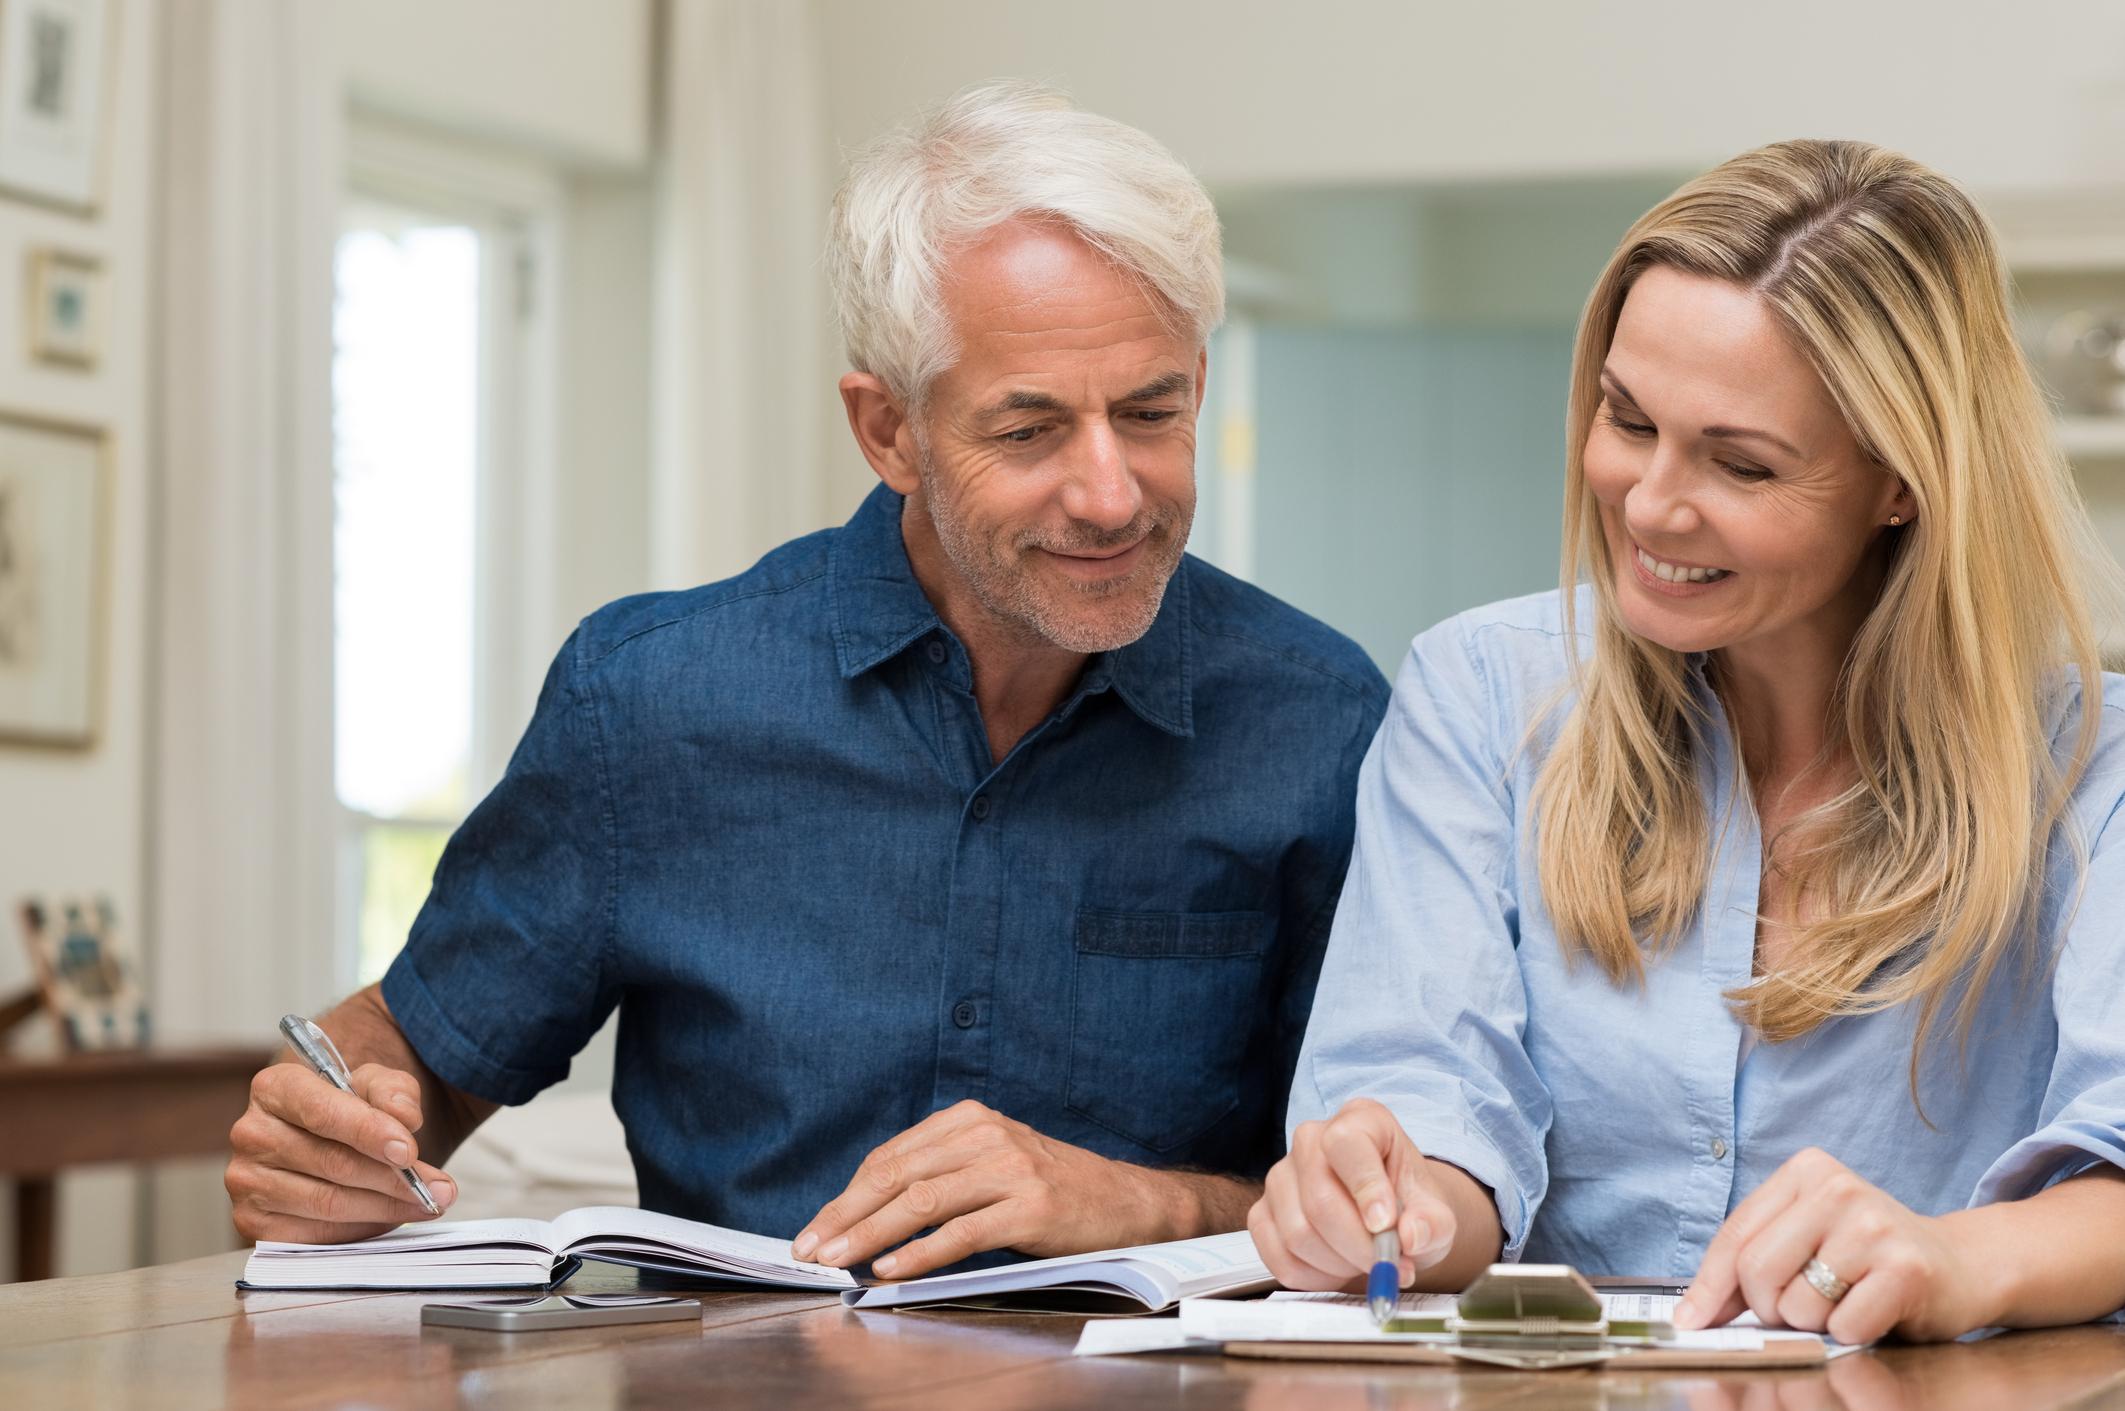 Mature couple discussing finances